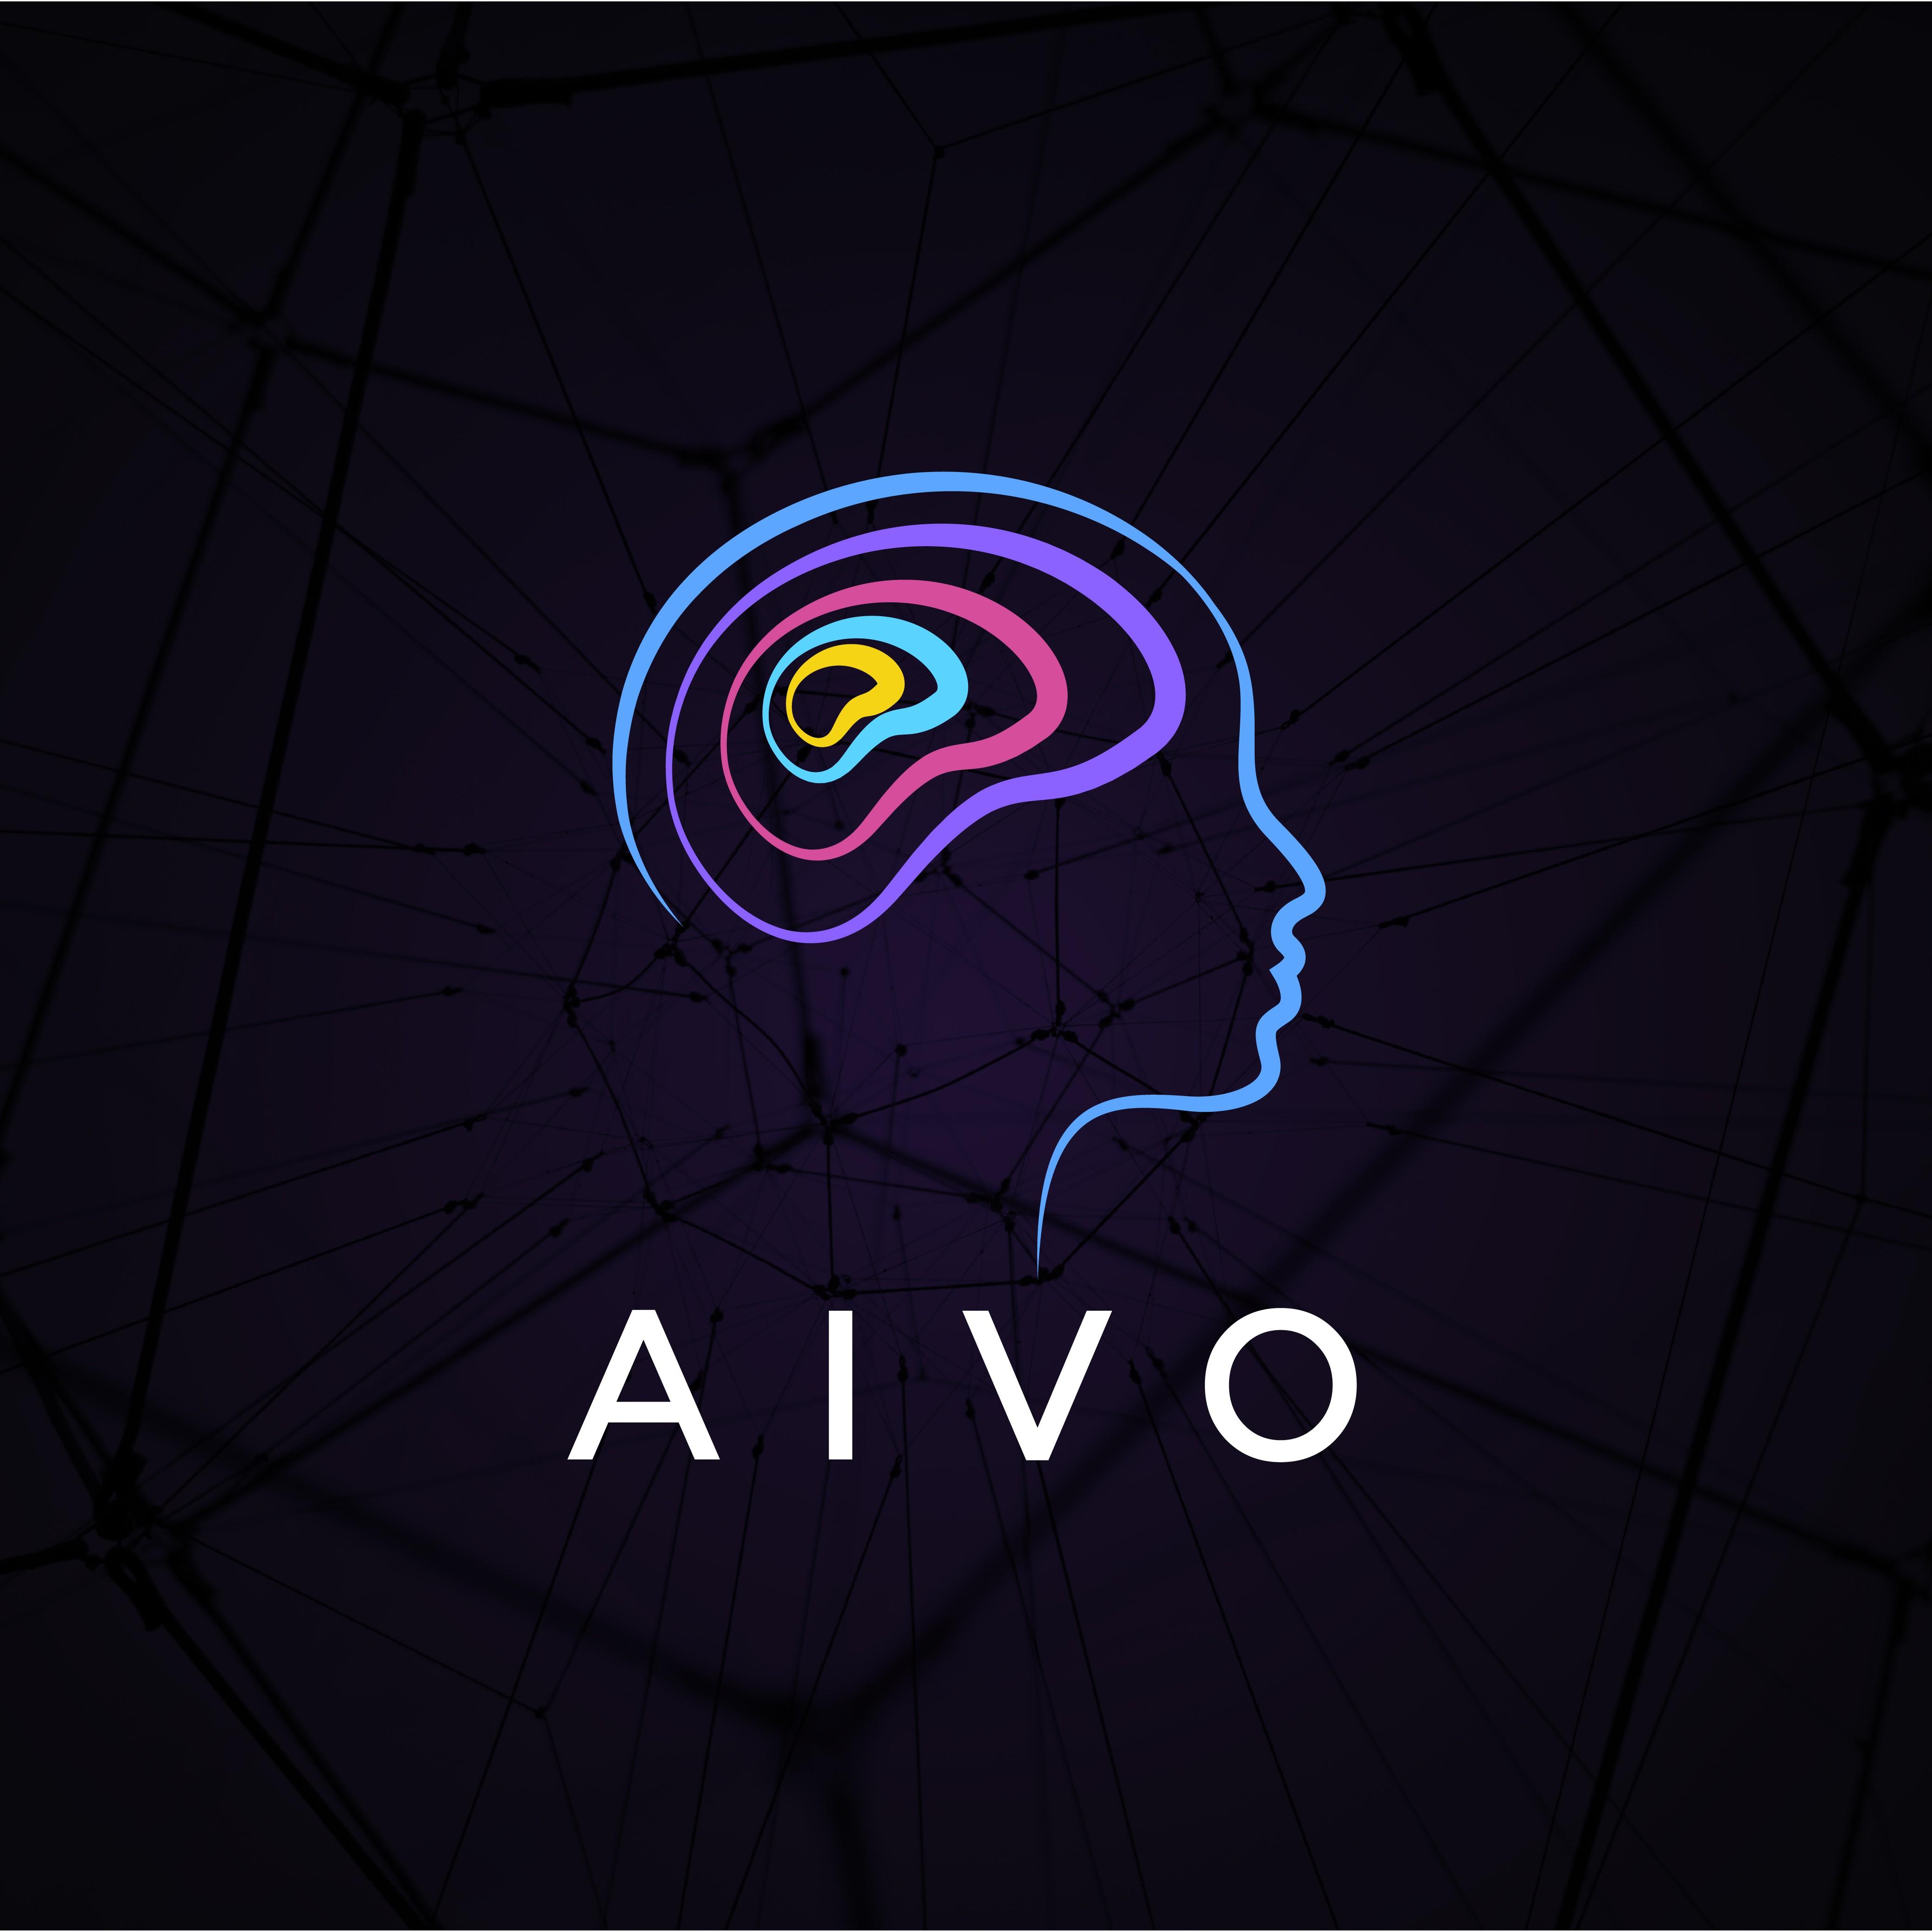 Neuroscience laboratory needs an elegant logo